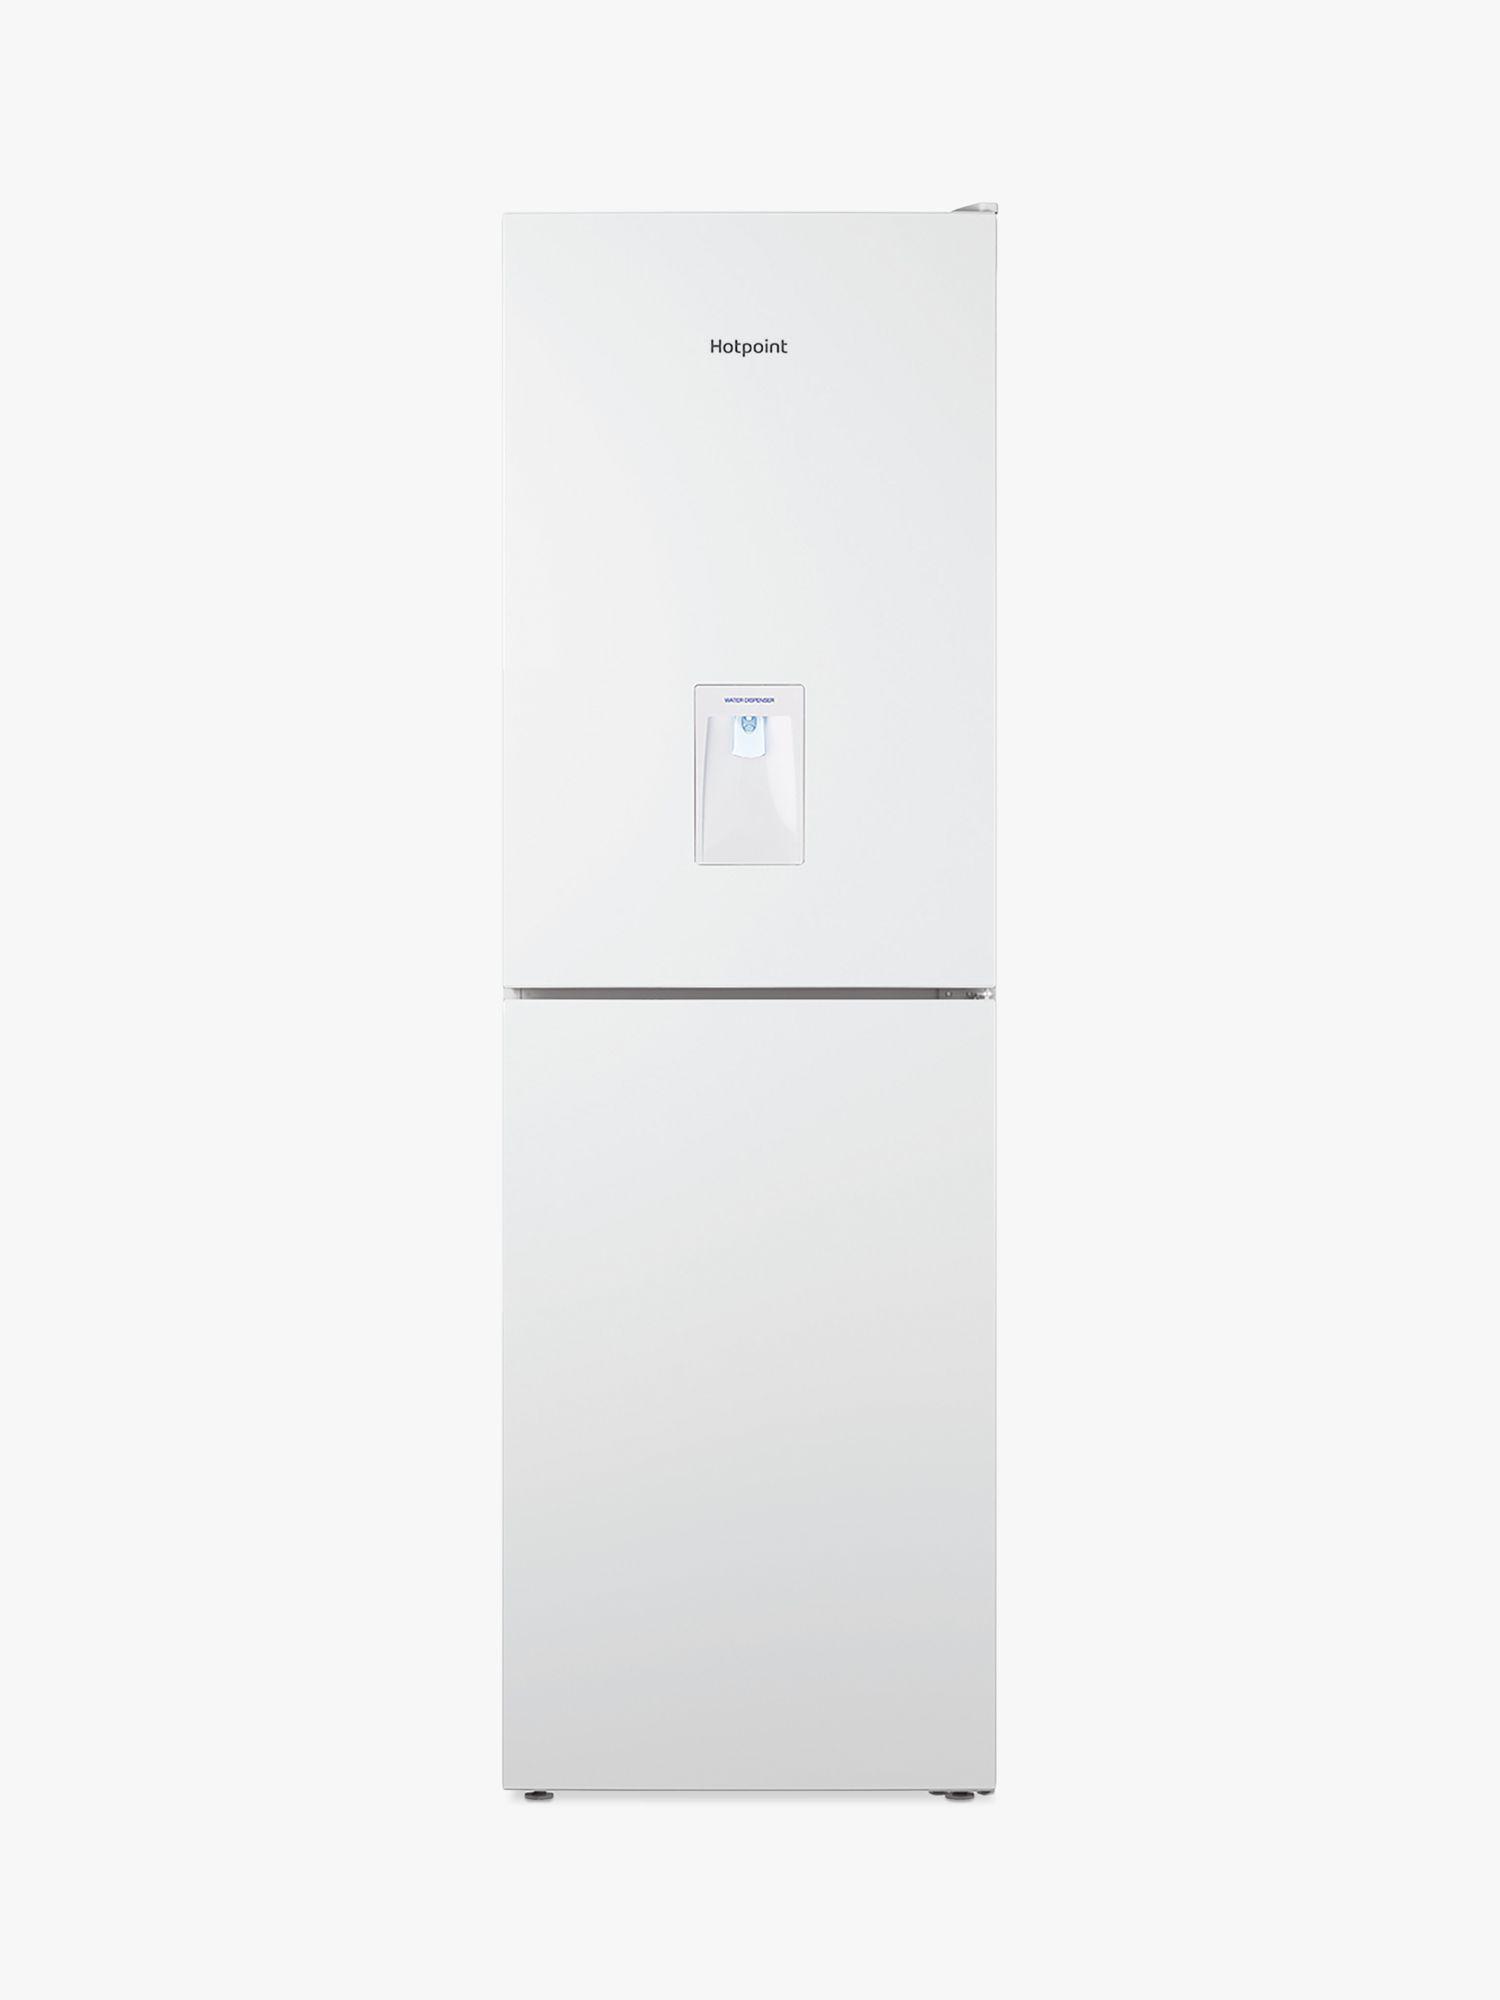 Hotpoint Hotpoint Day1 XAL85T1IWWTD Freestanding Fridge Freezer, A+ Energy Rating, 60cm Wide, White